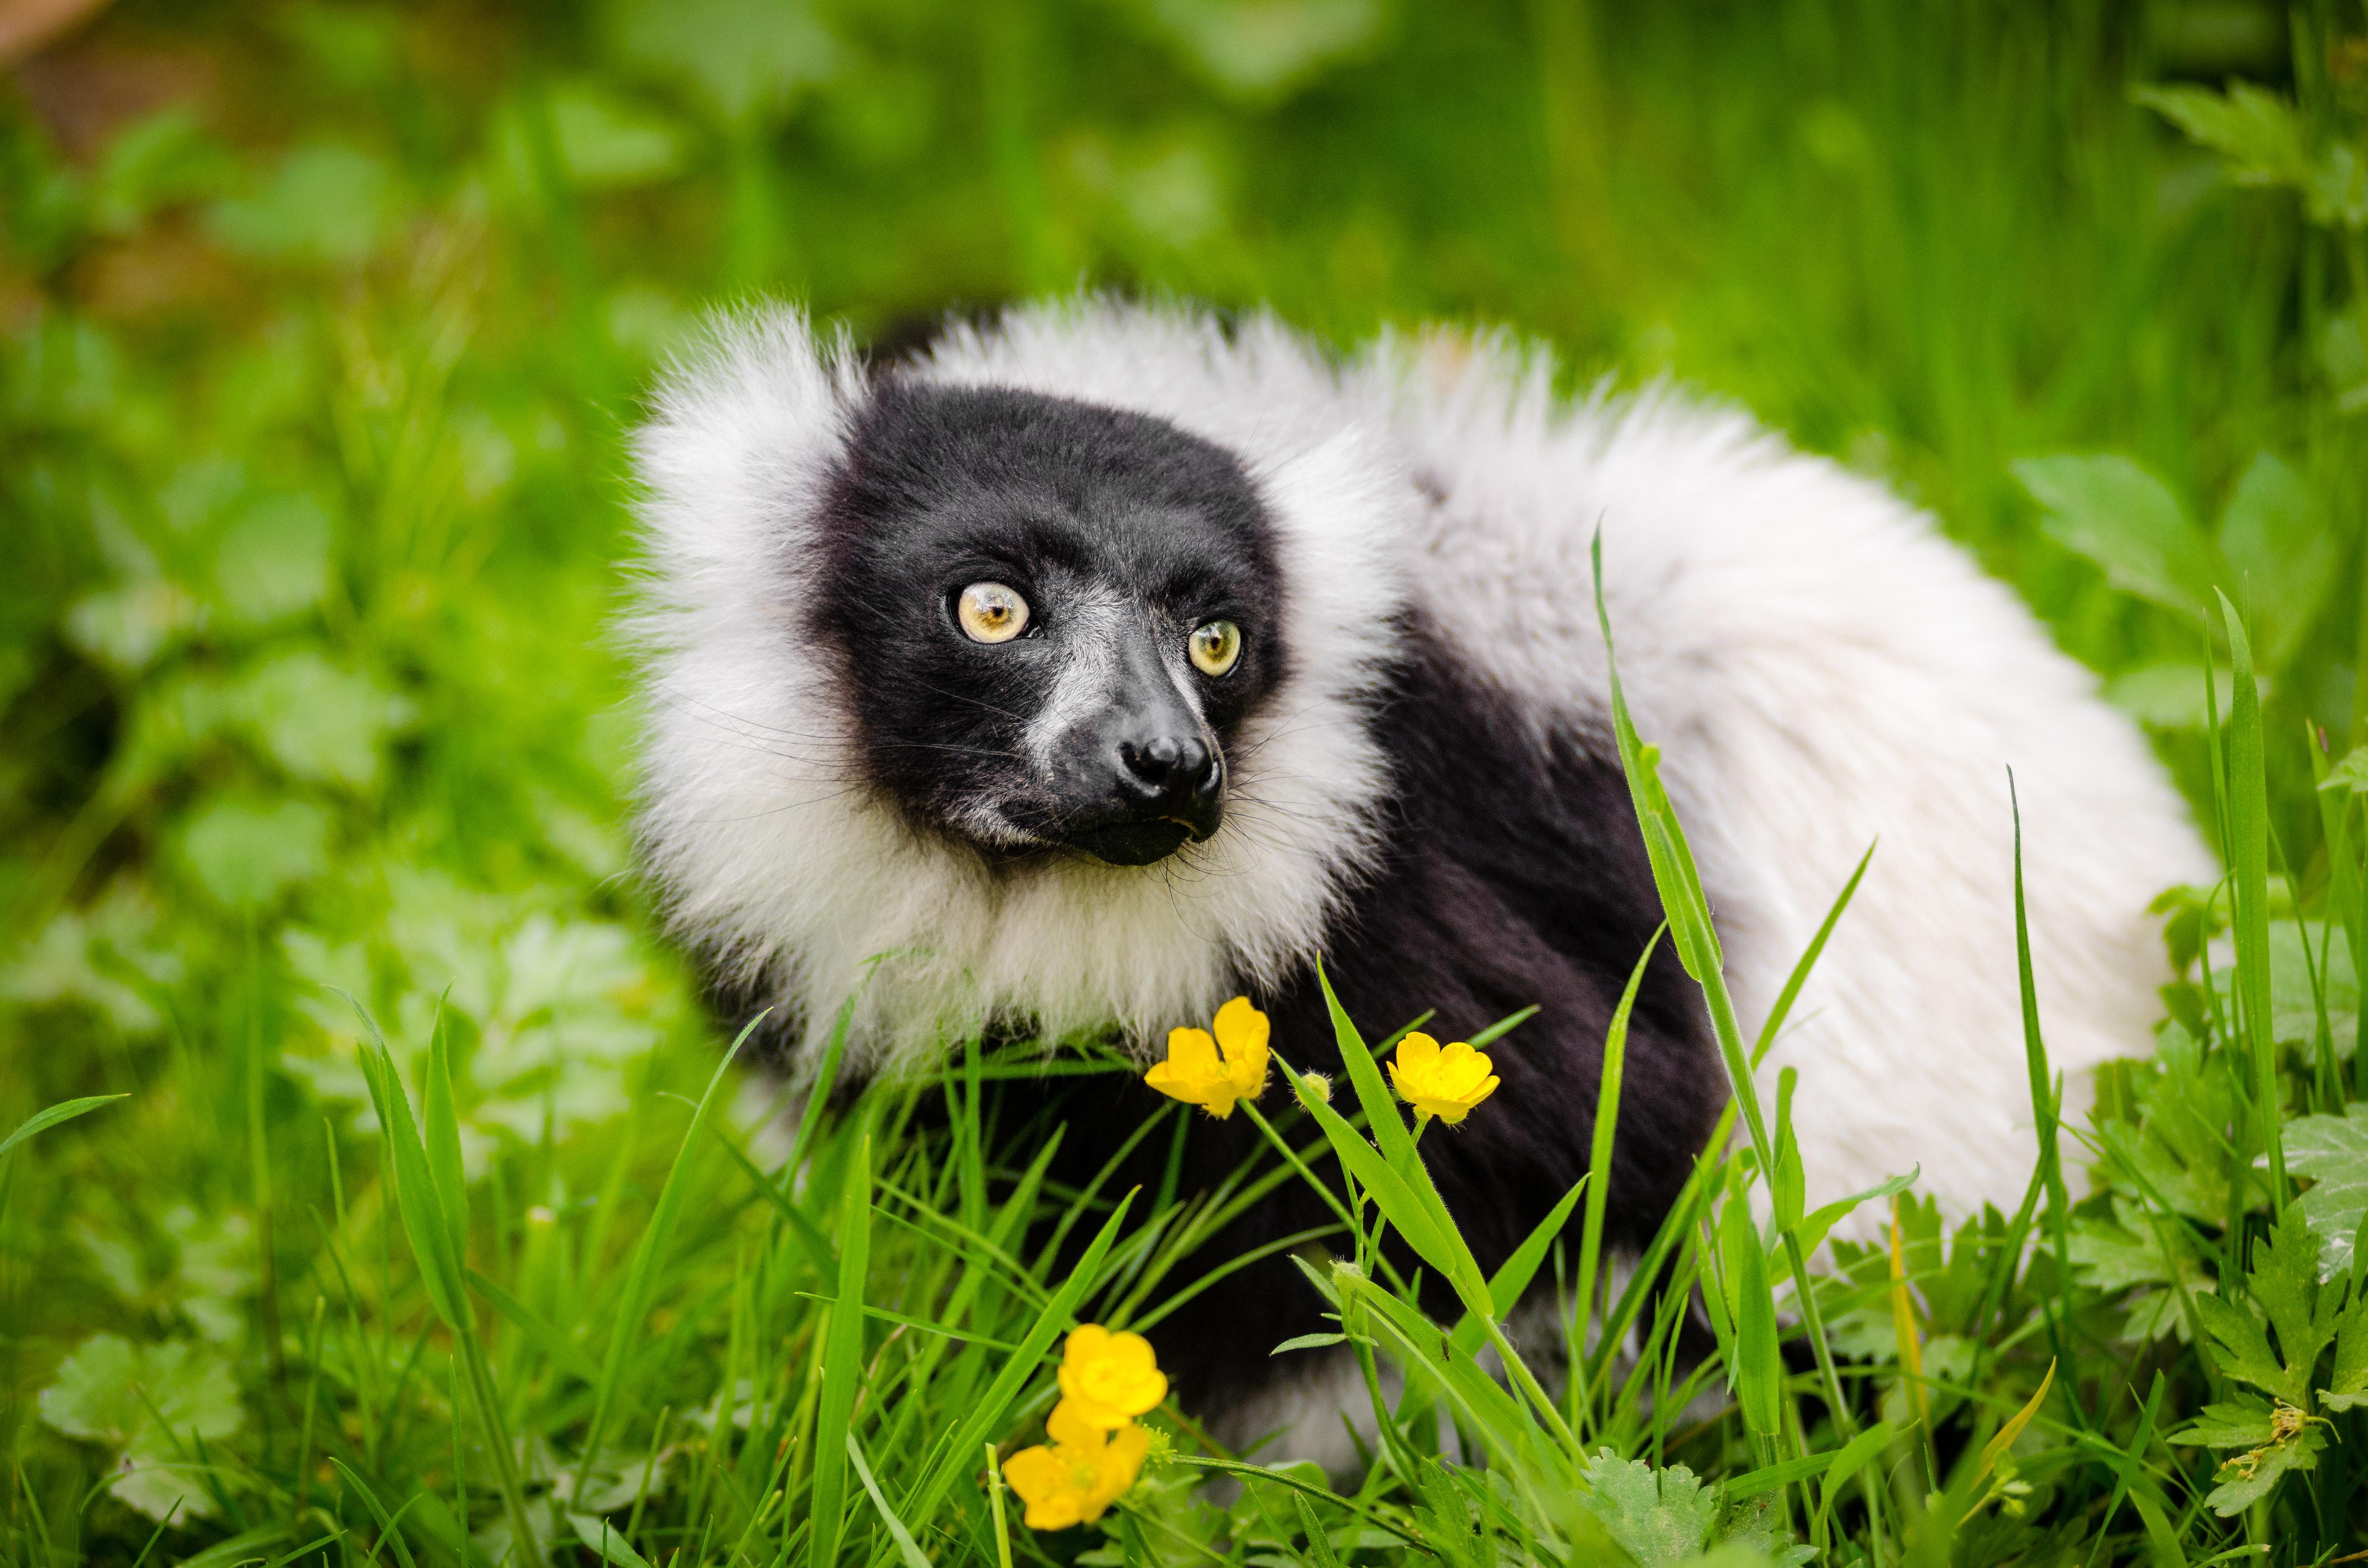 Gray And White Lemur 183 Free Stock Photo